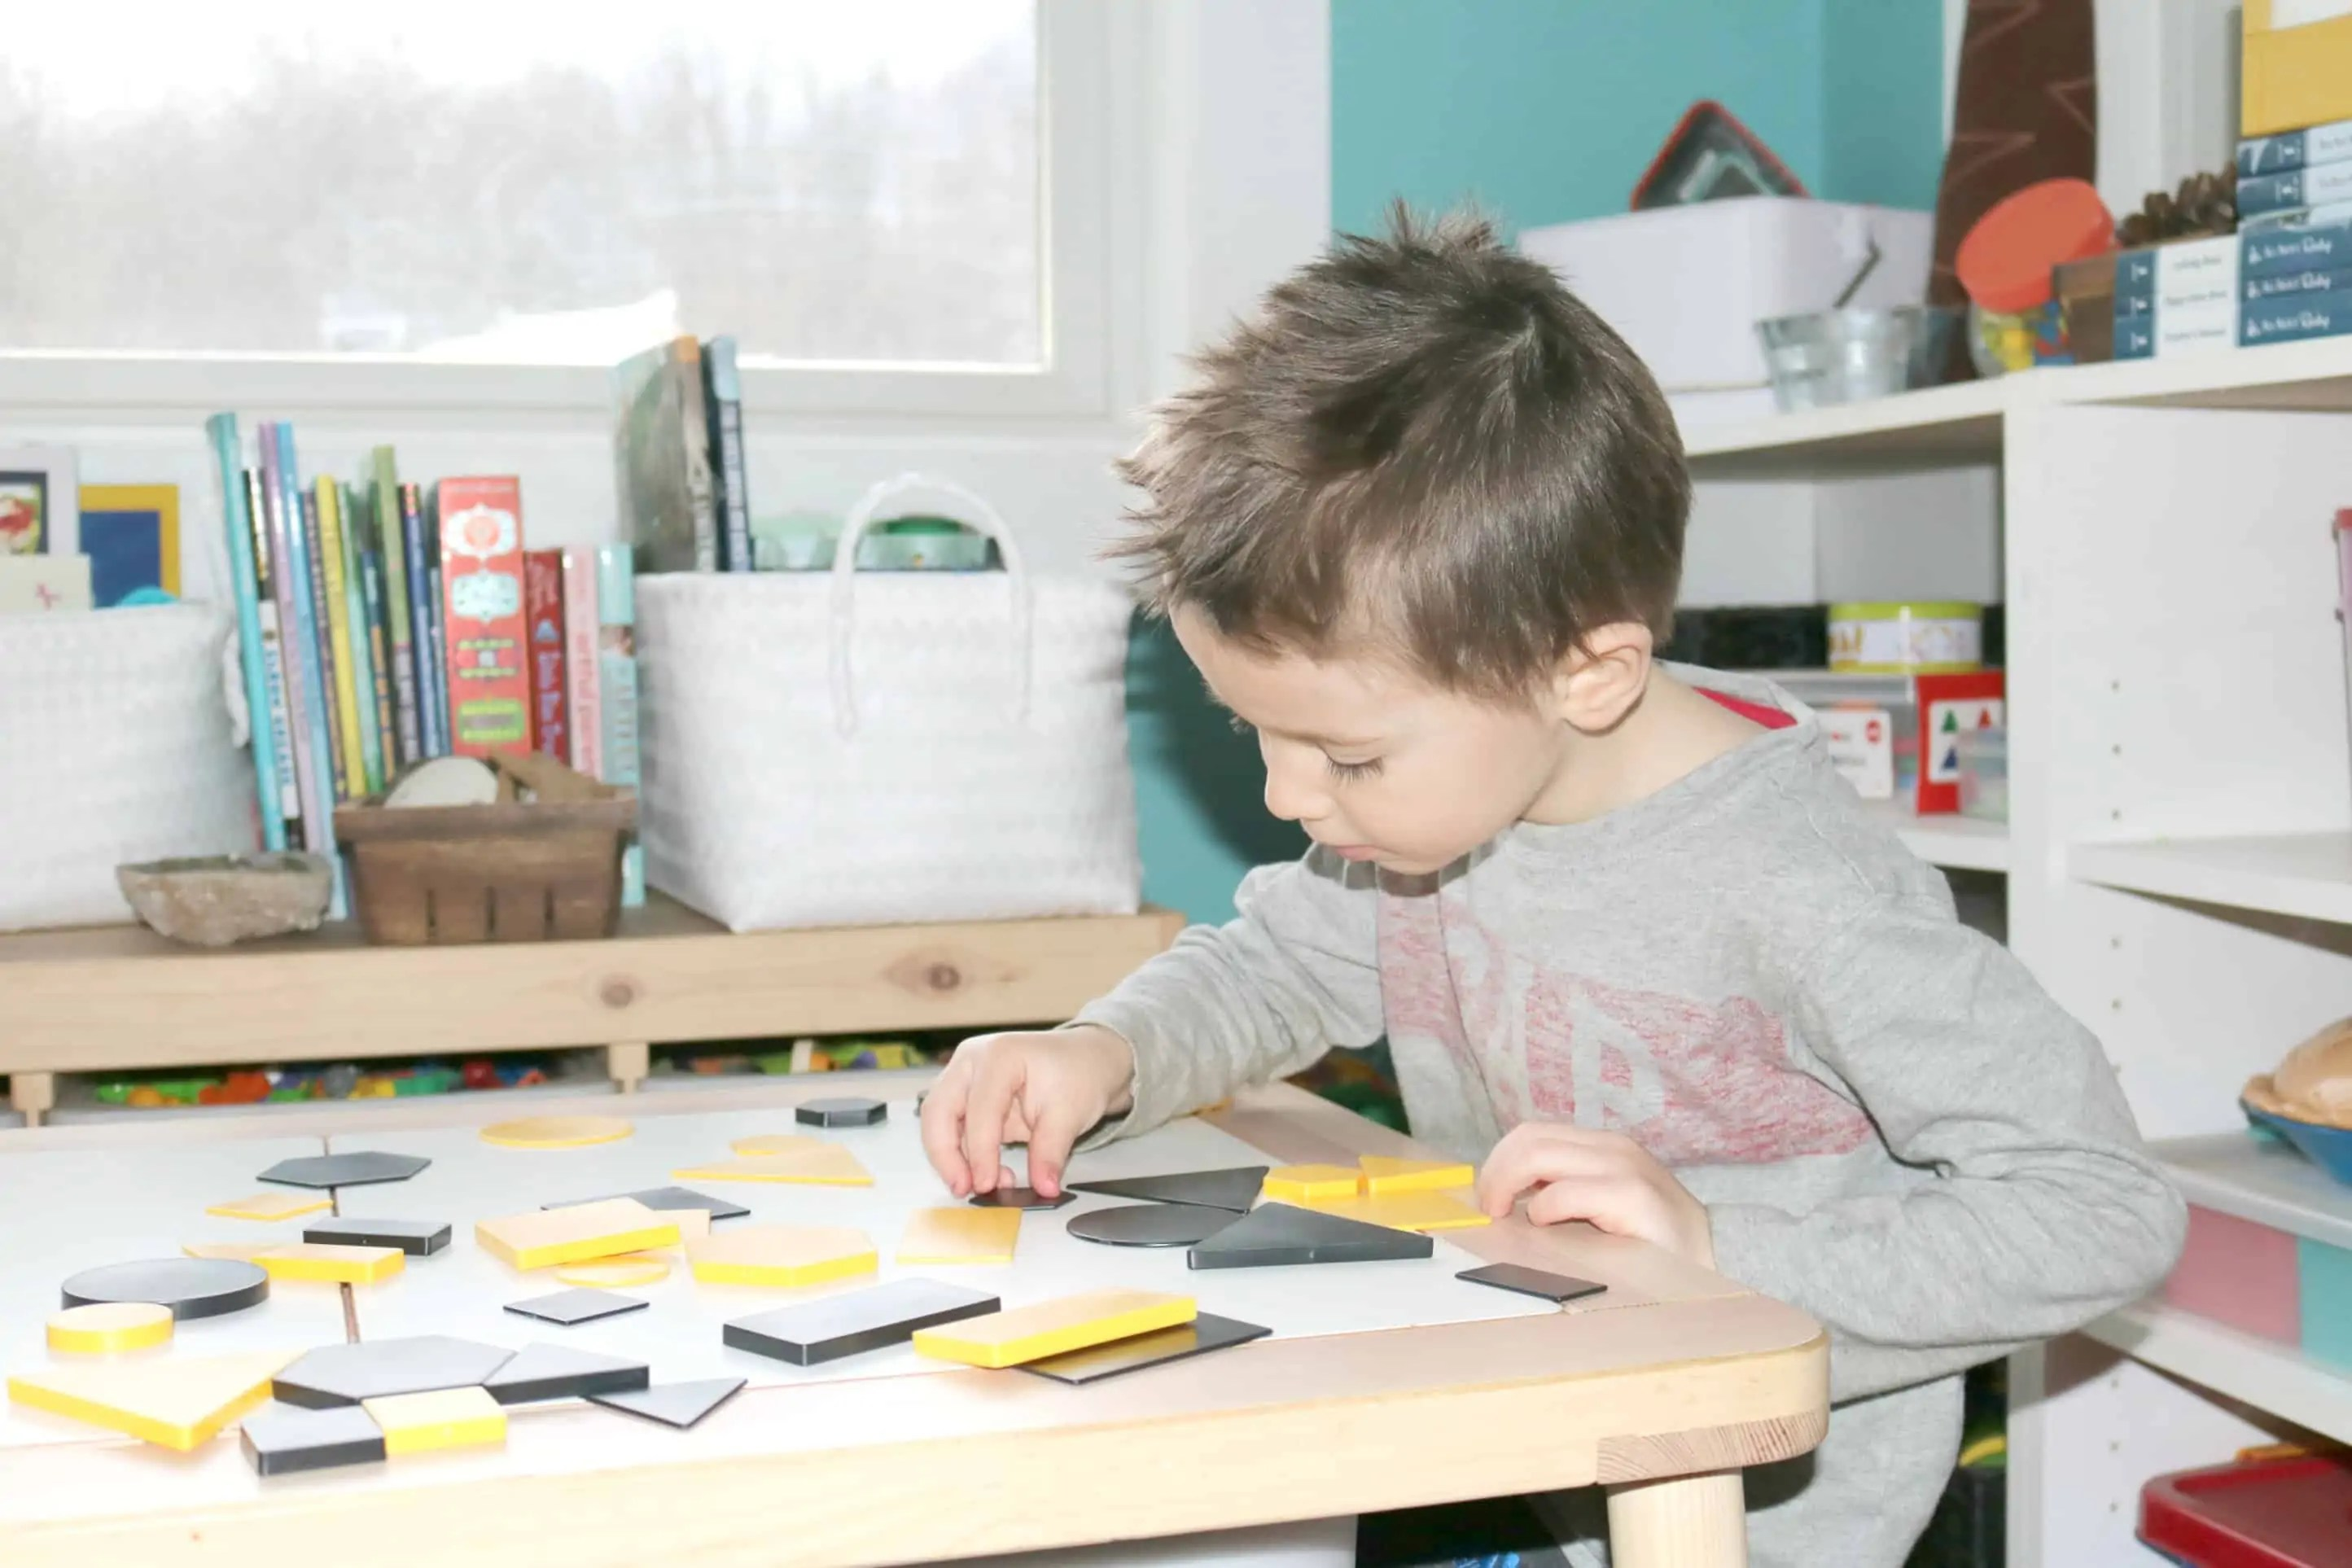 Using Preschool Manipulatives In Your Homeschool